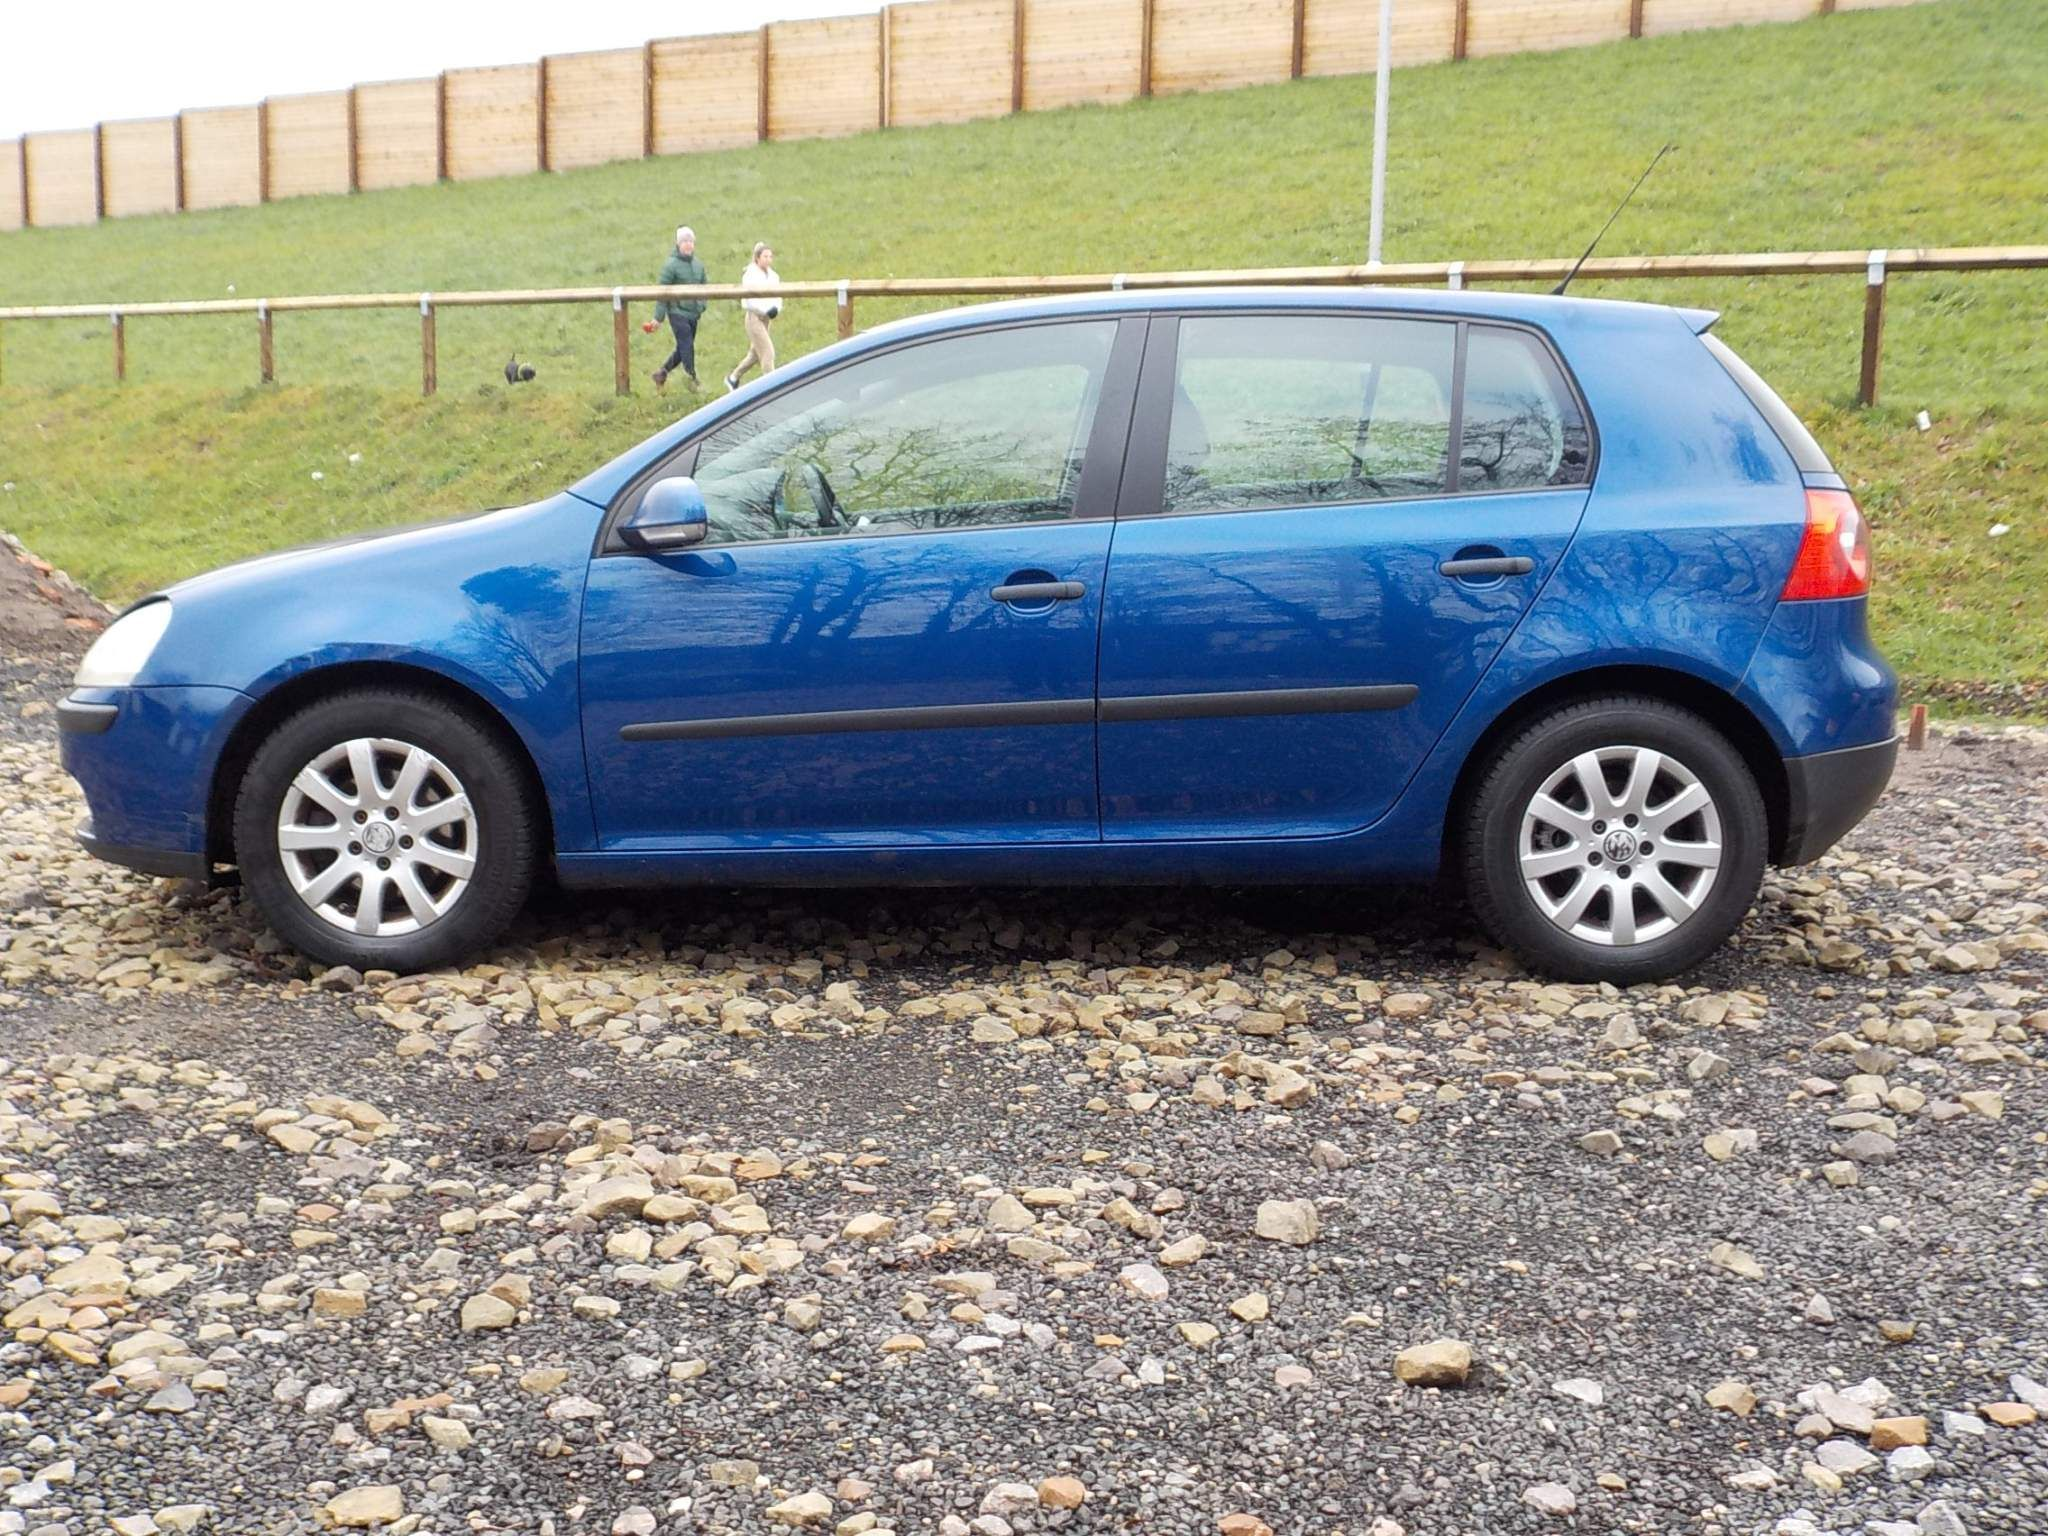 Volkswagen Golf 1.9 TDI SE 5dr